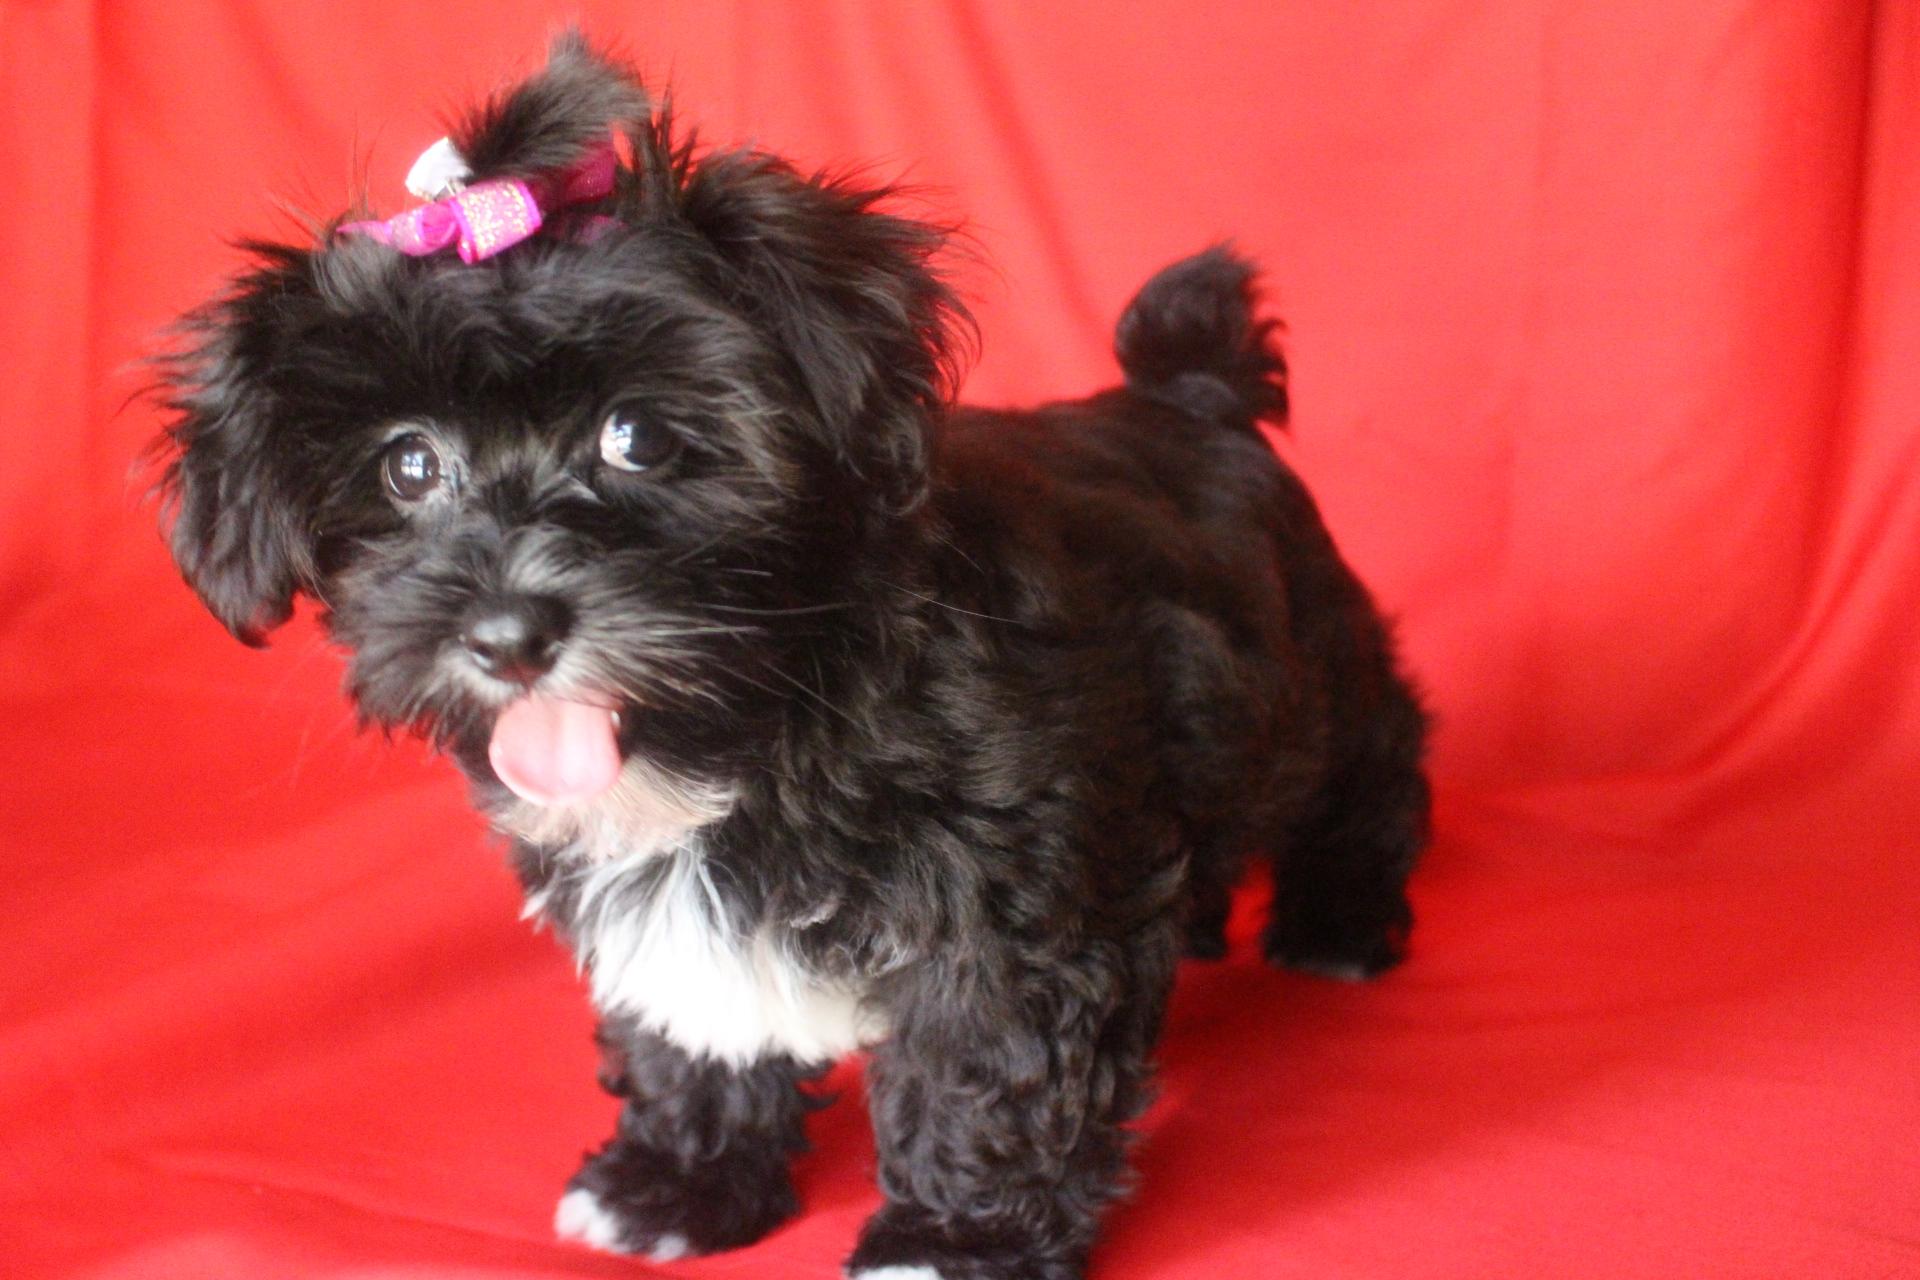 meet female a cute shorkie puppy for sale for 600 tessie